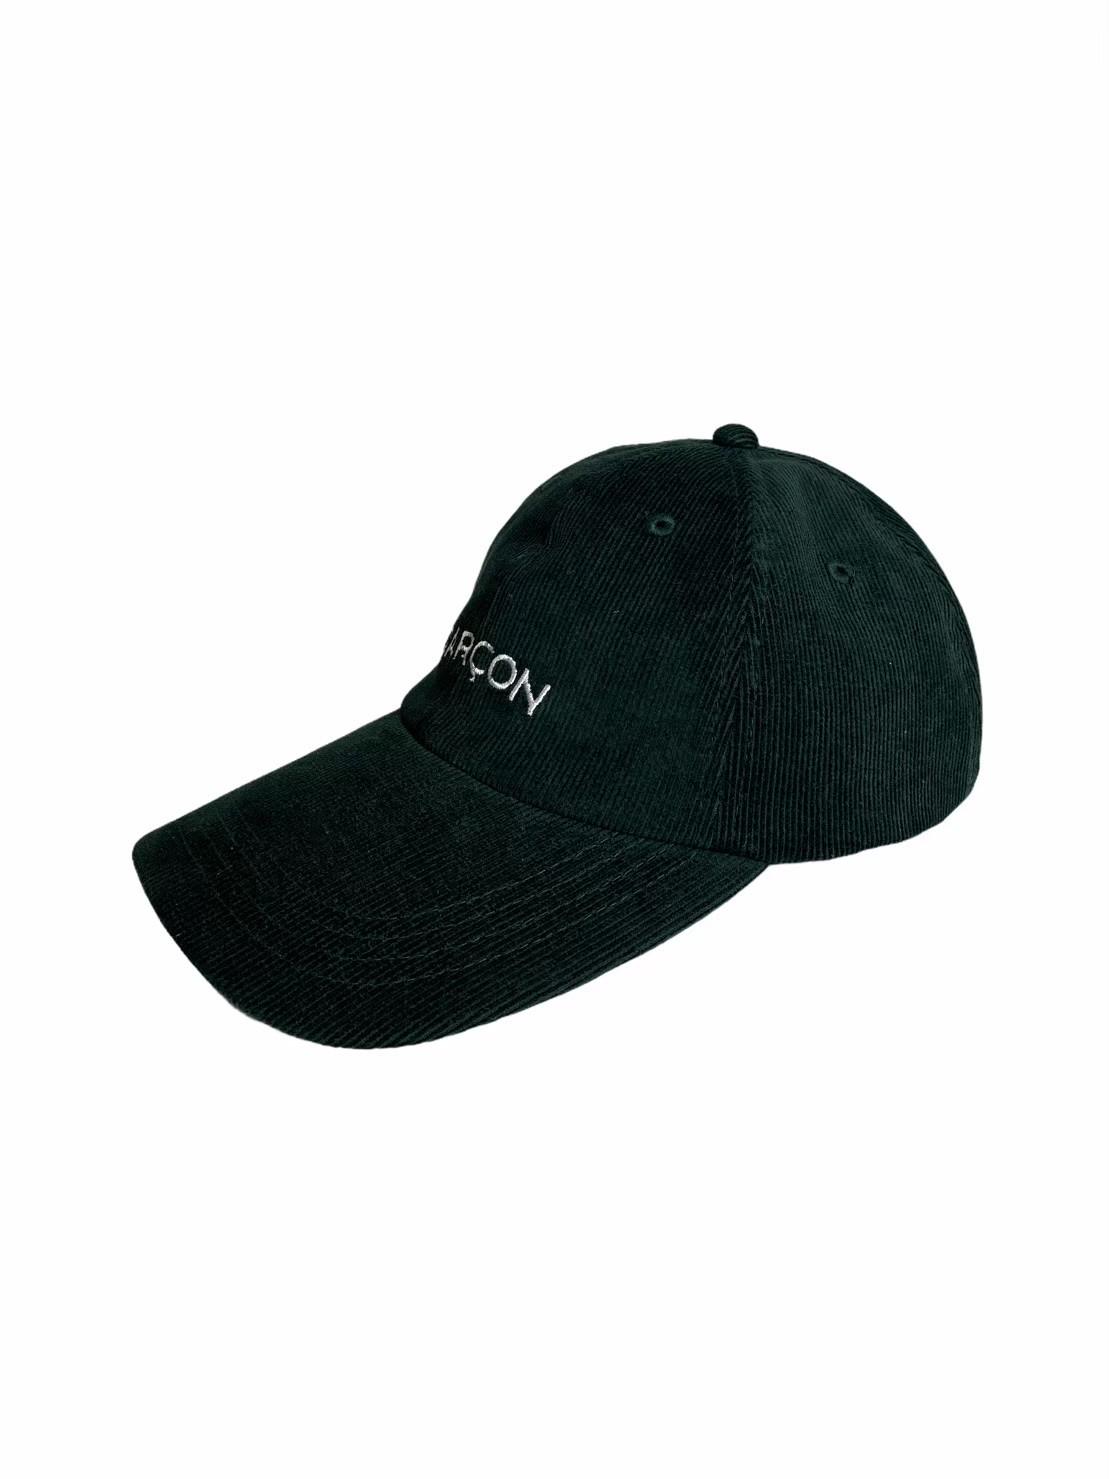 Garcon Cap (Dark Green)